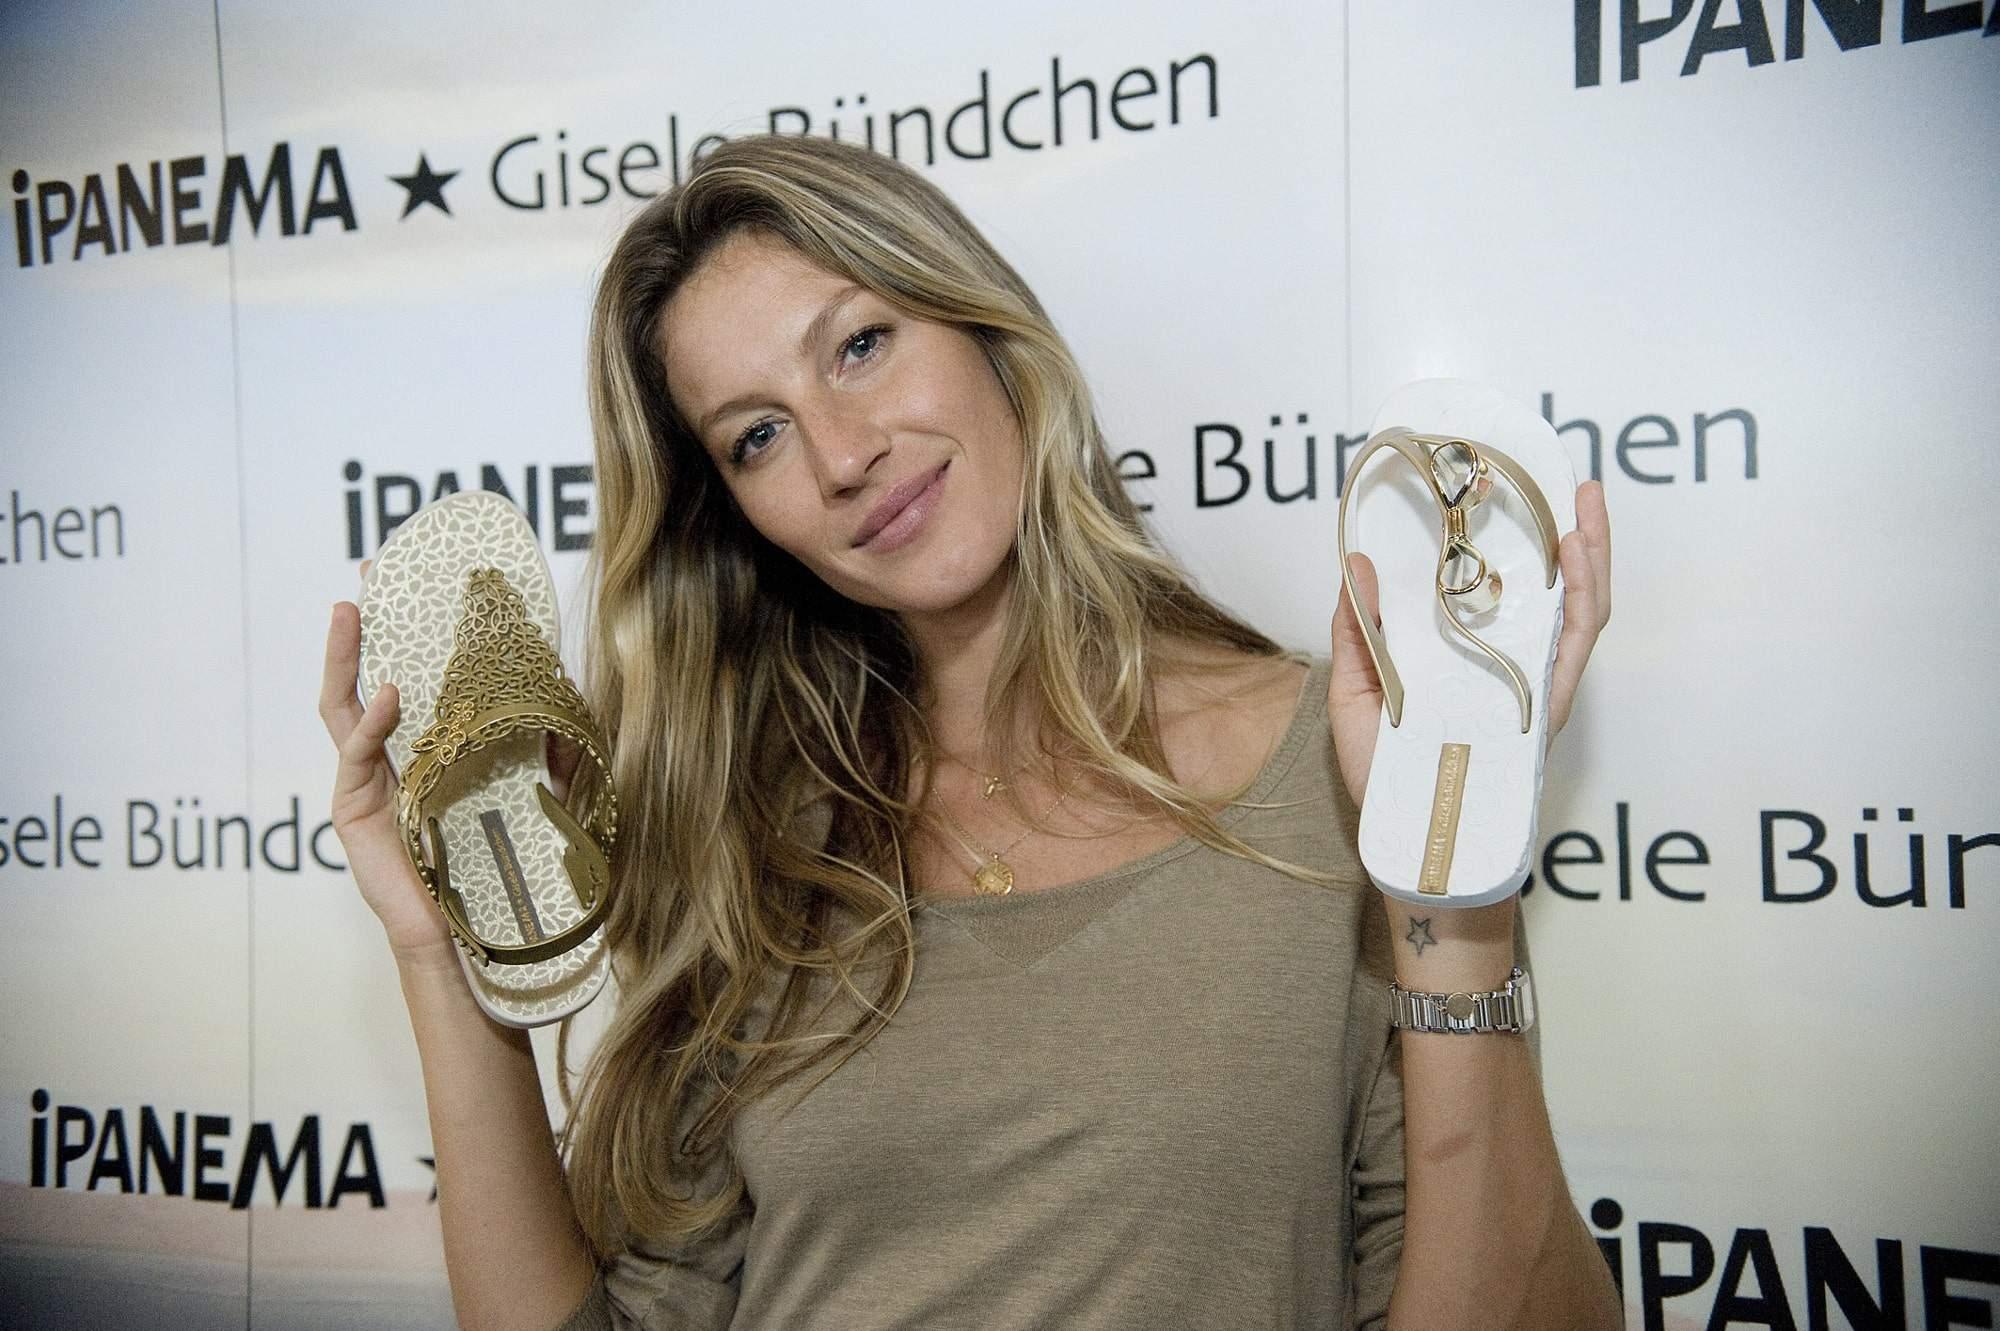 Gisele Bündc